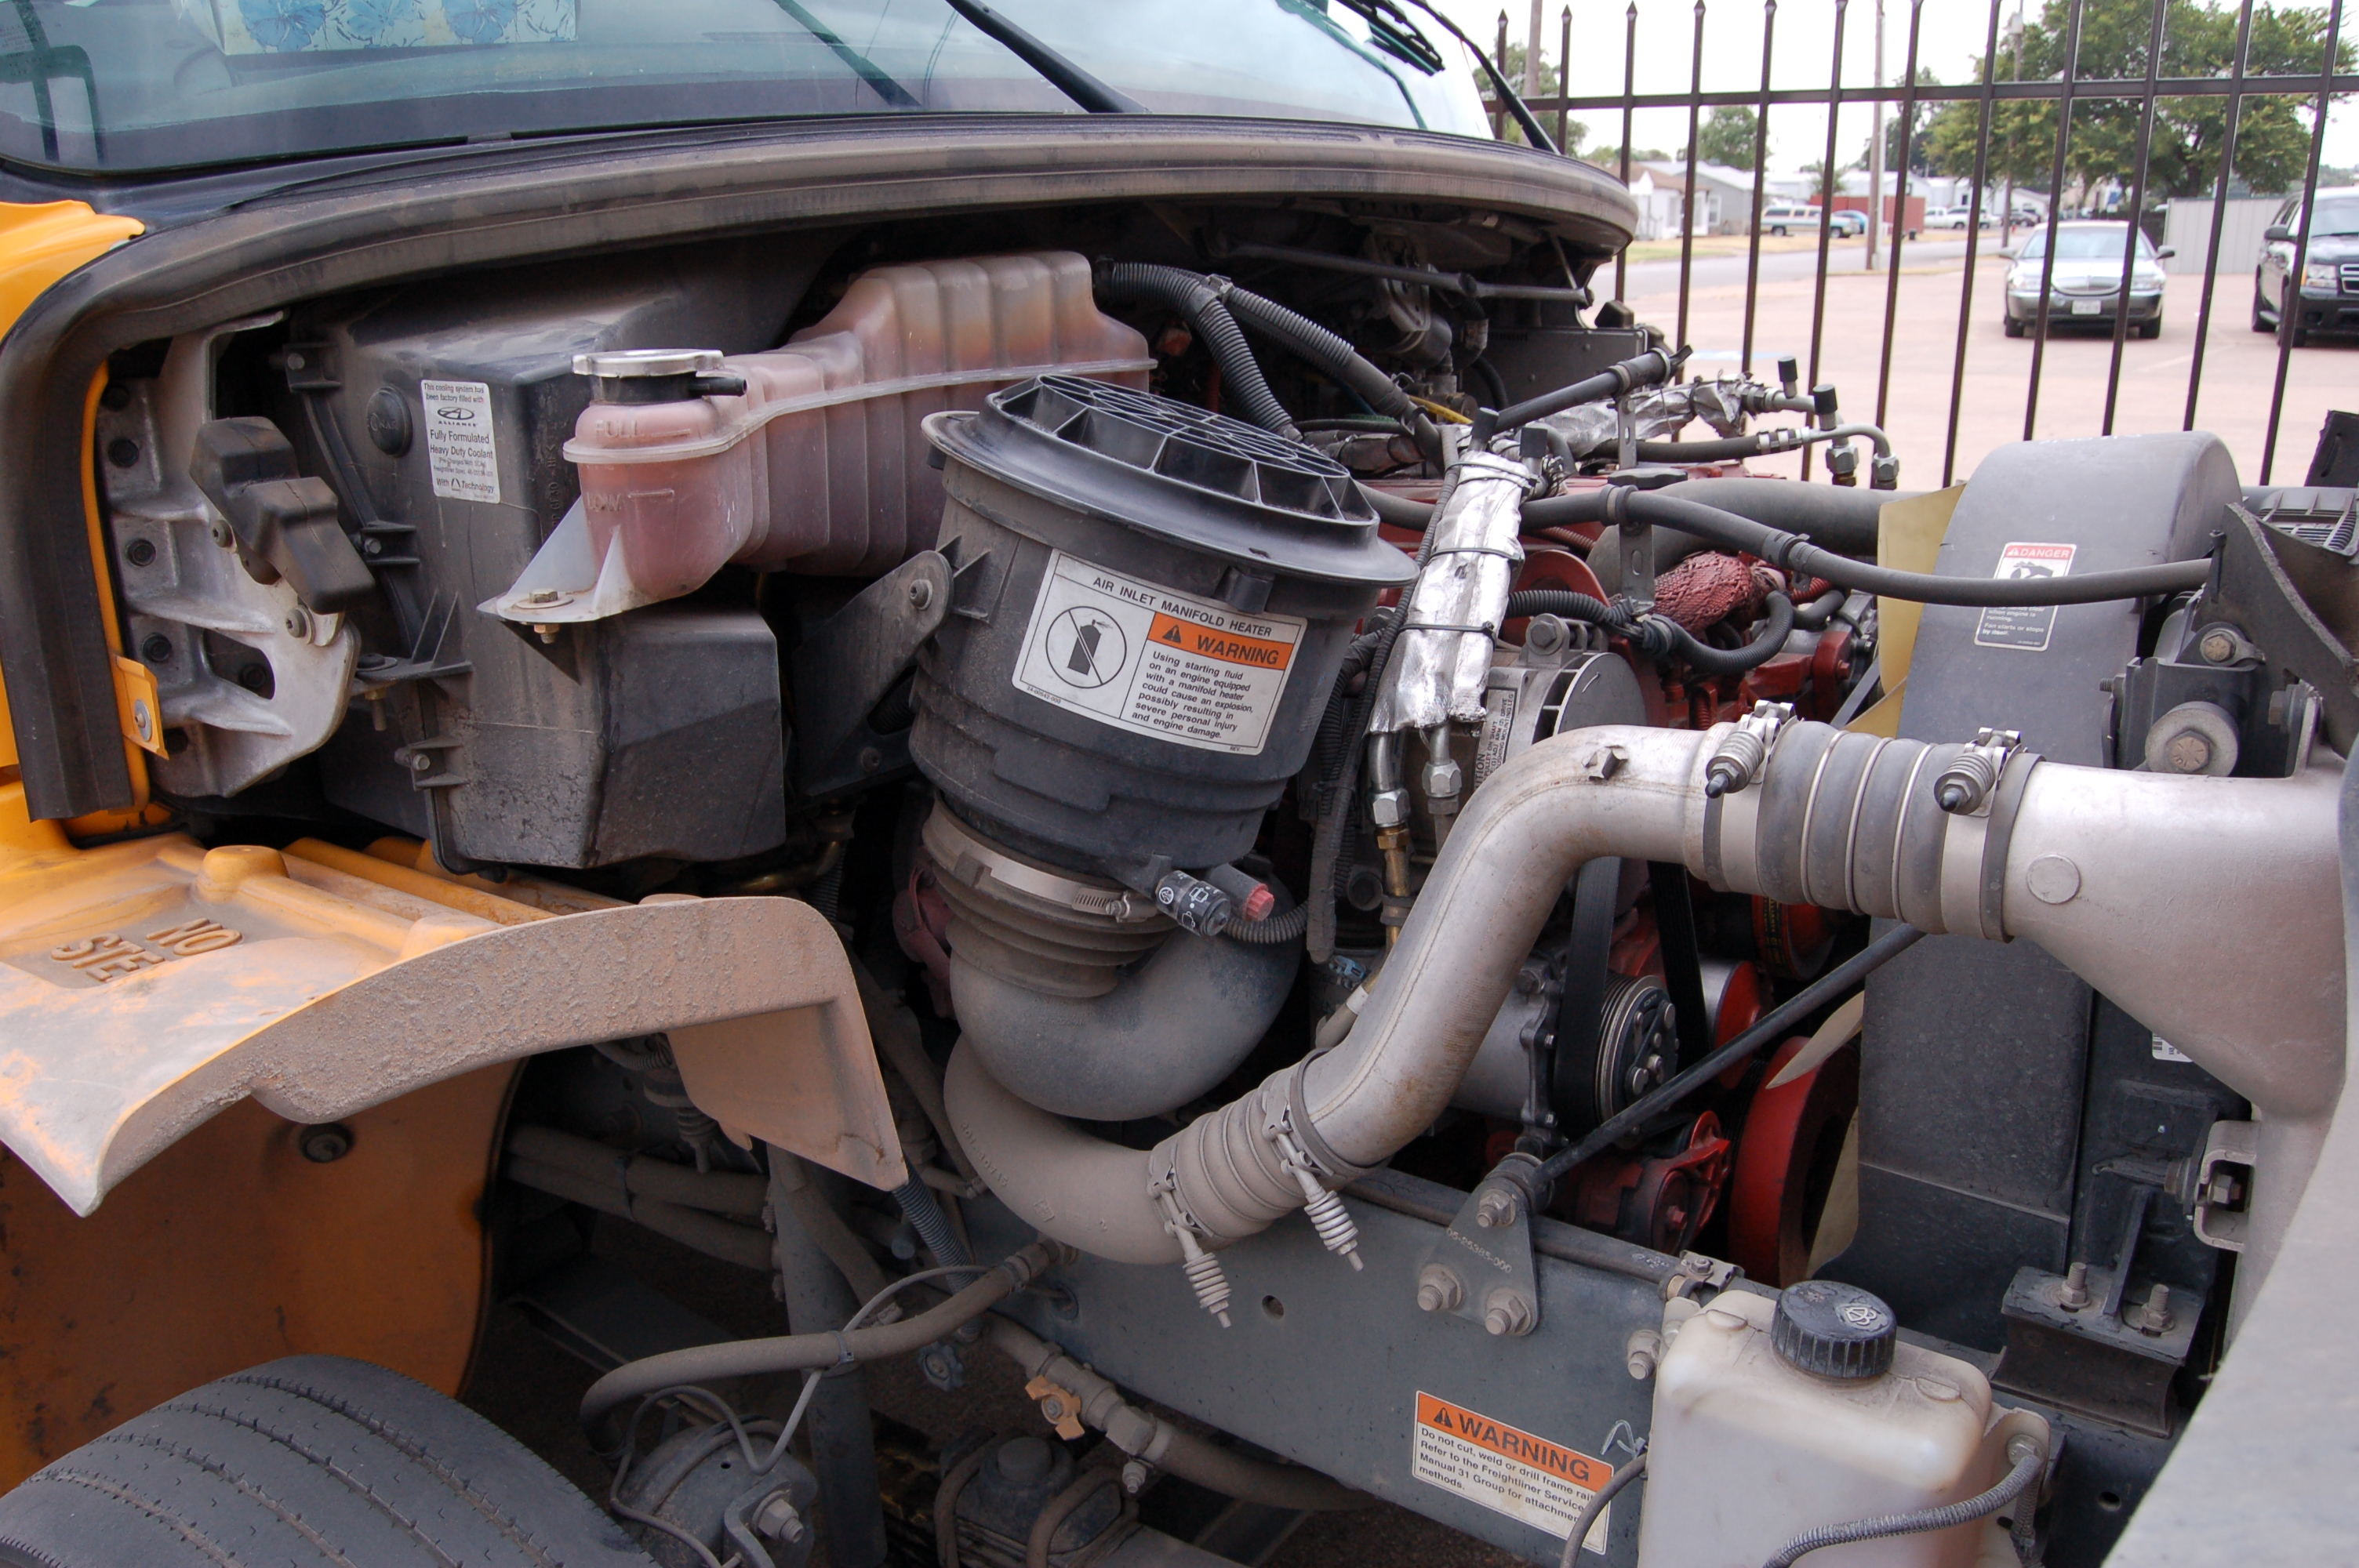 bus engine compartment diagram fisher plow repair manual cdl pre trip